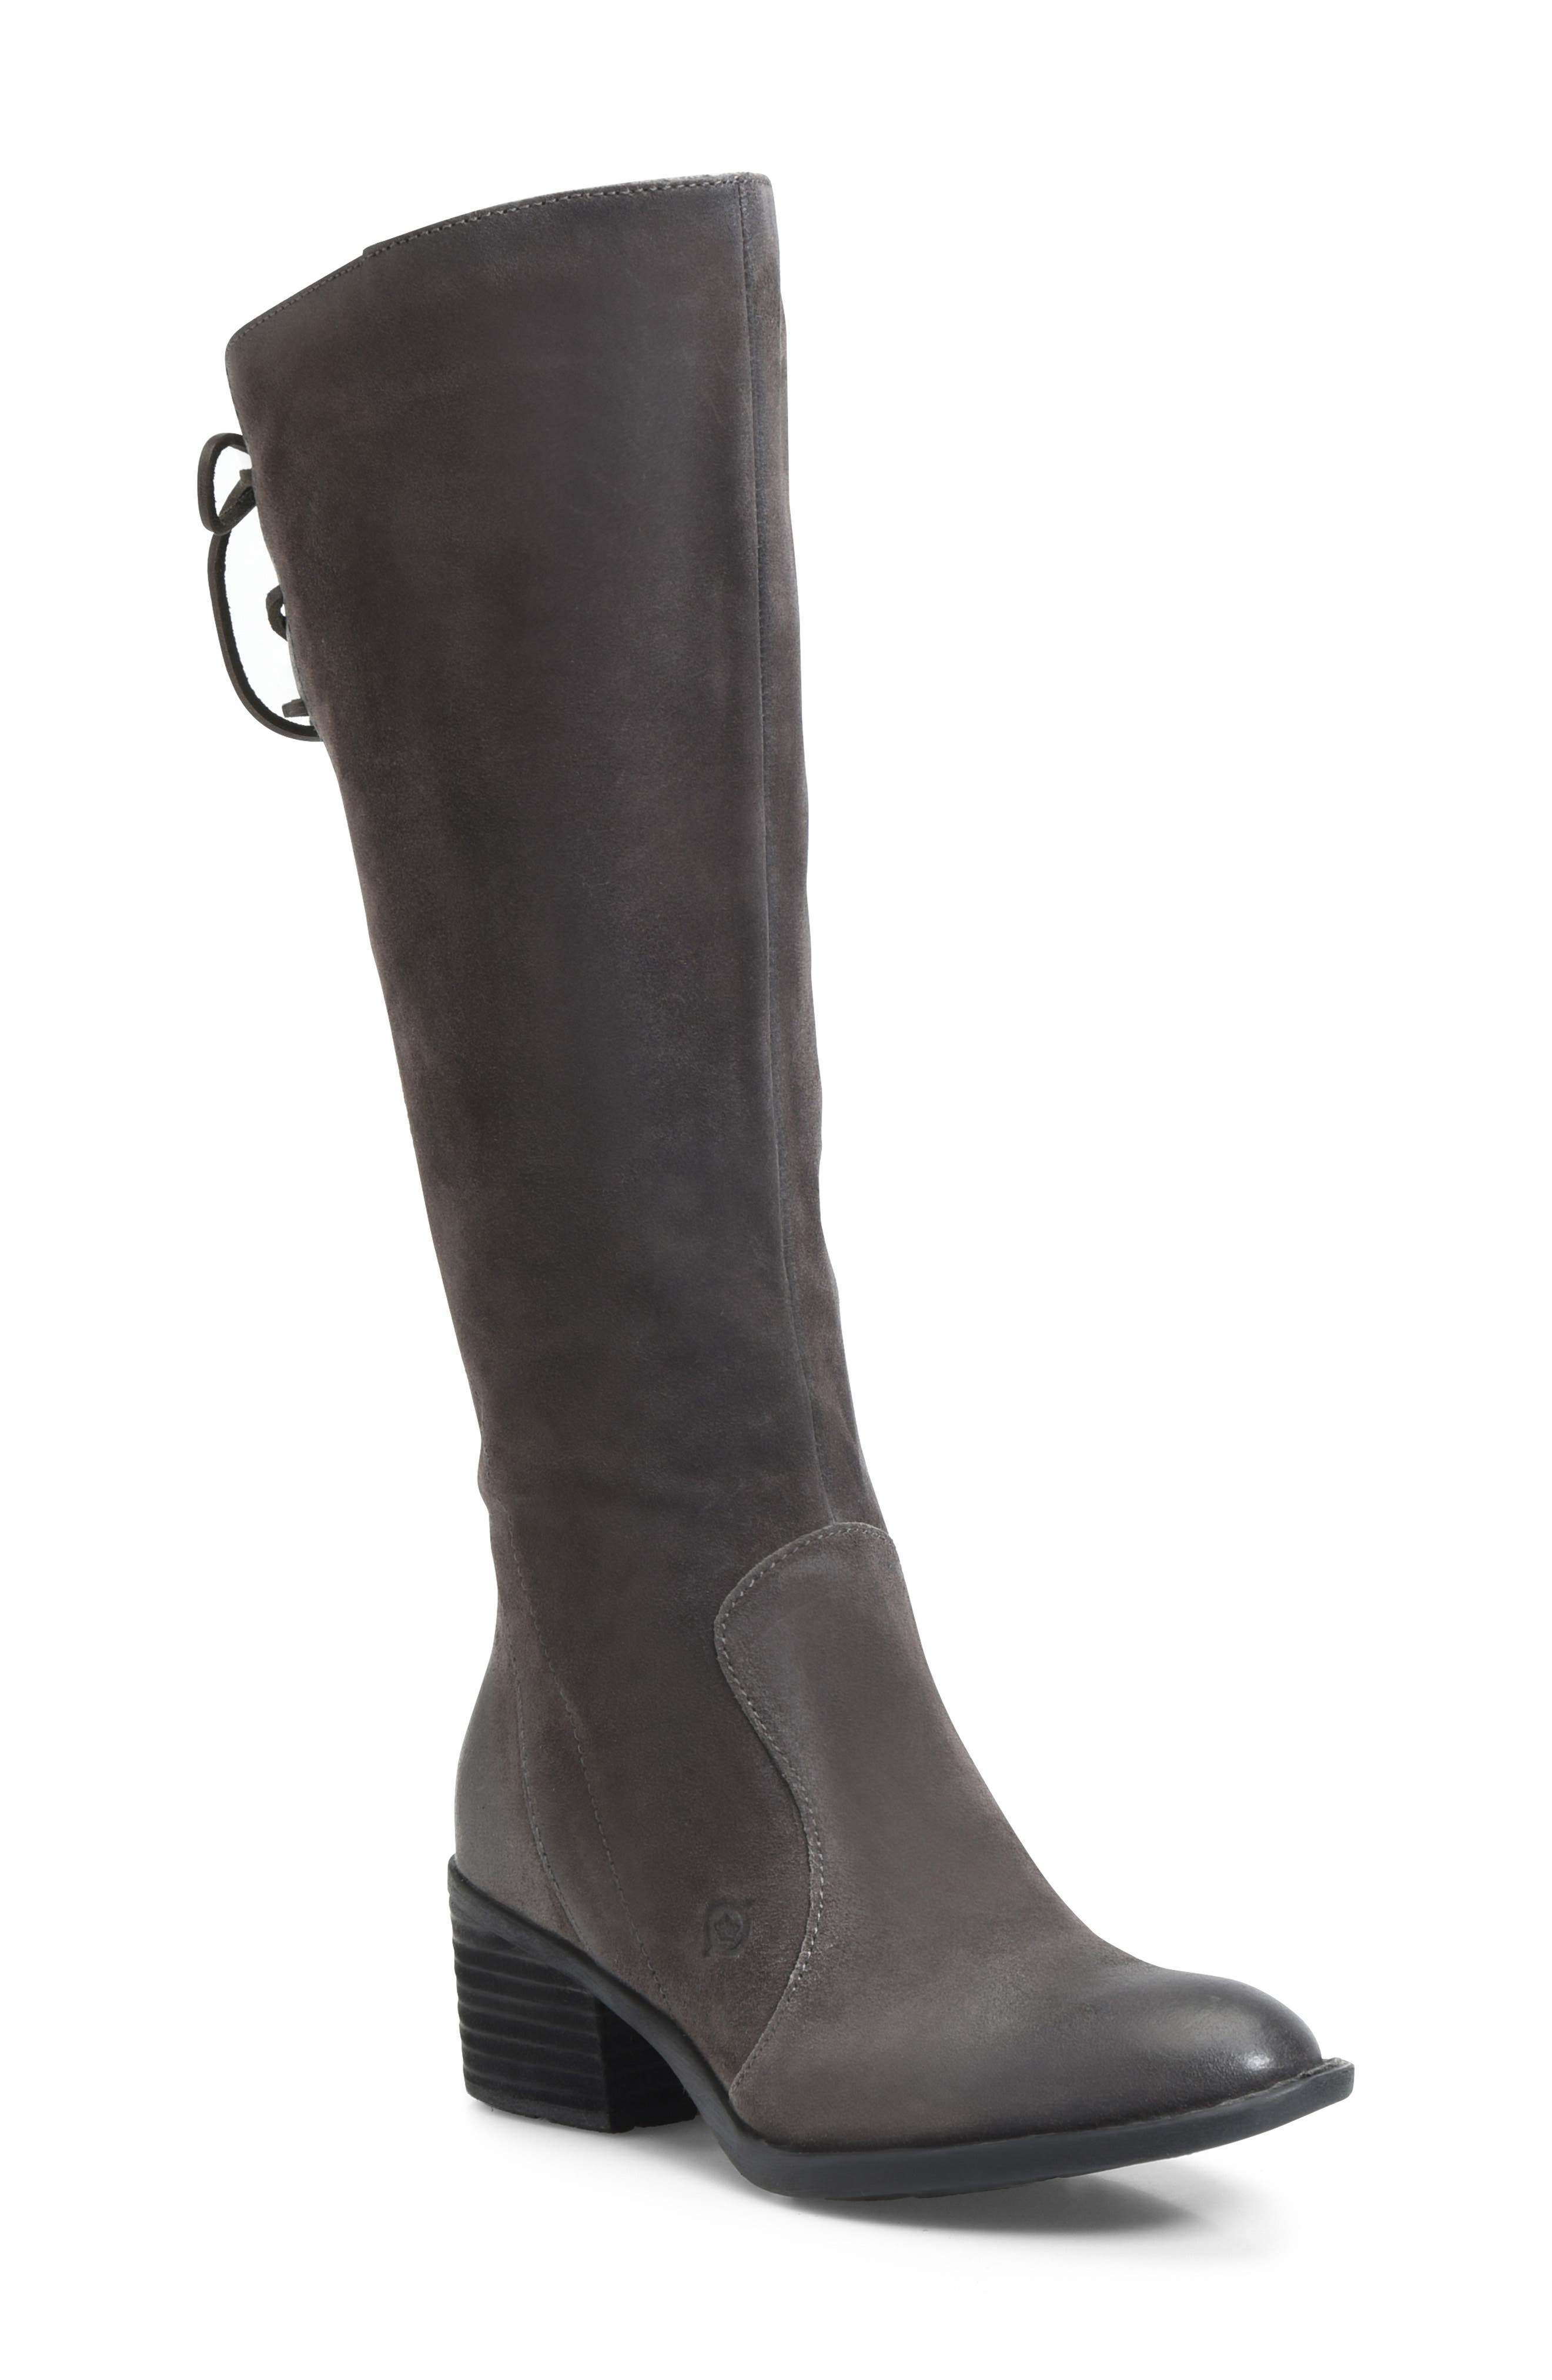 B?rn Felicia Knee High Boot Regular Calf- Grey